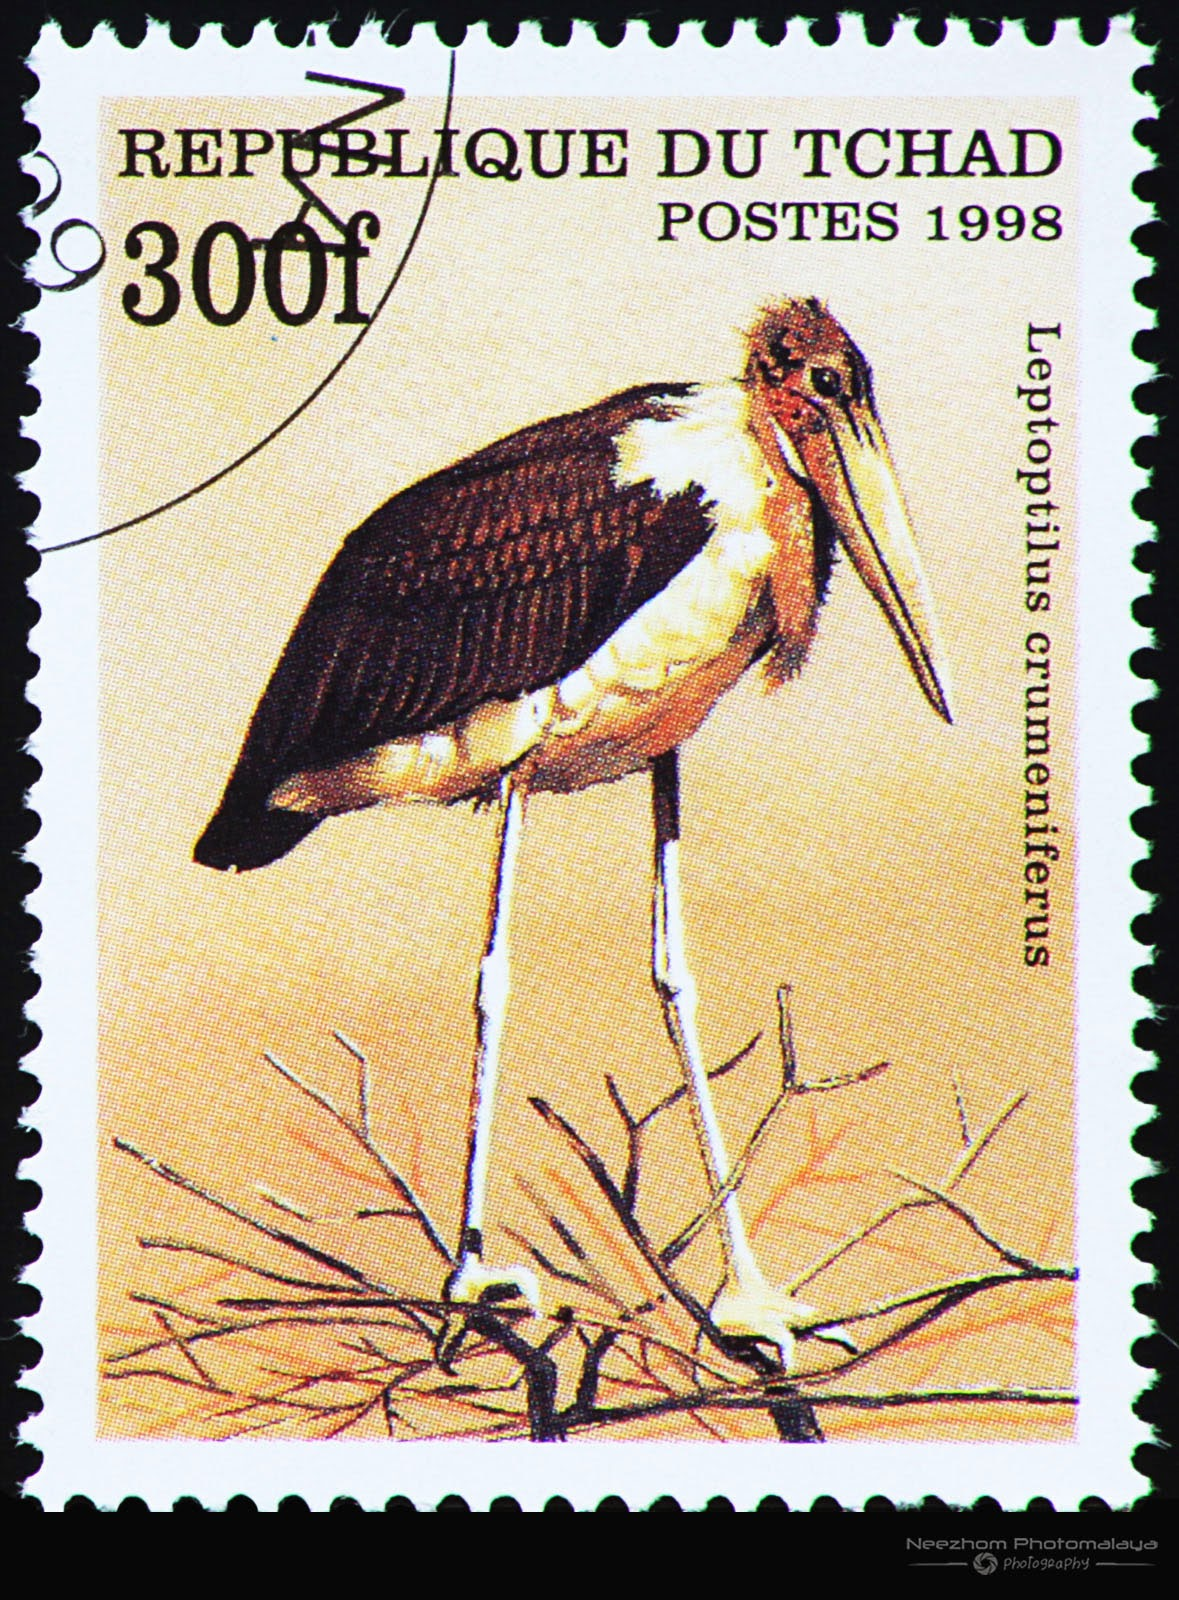 Chad 1998 Birds stamp - Marabou Stork (Leptoptilus crumeniferus) 300 f